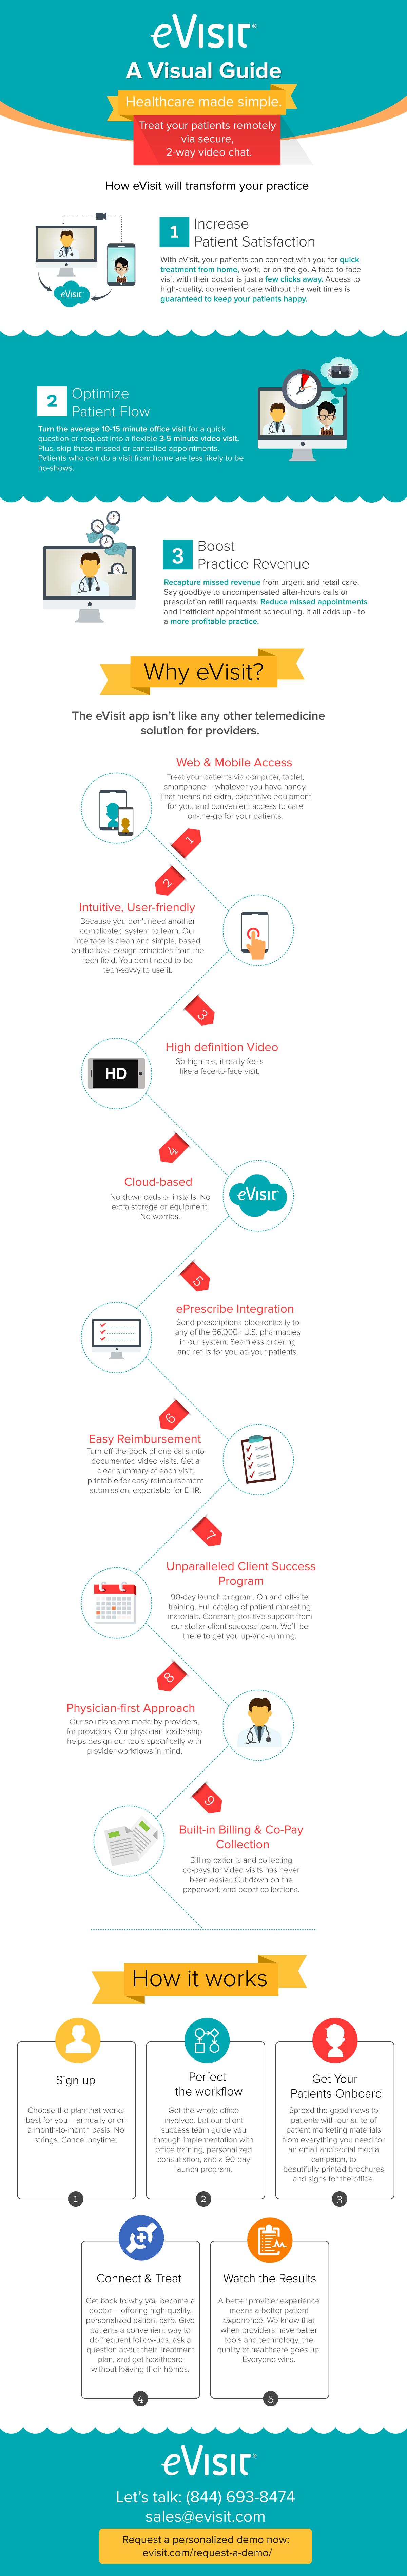 eVisit Telemedicine software Infographic